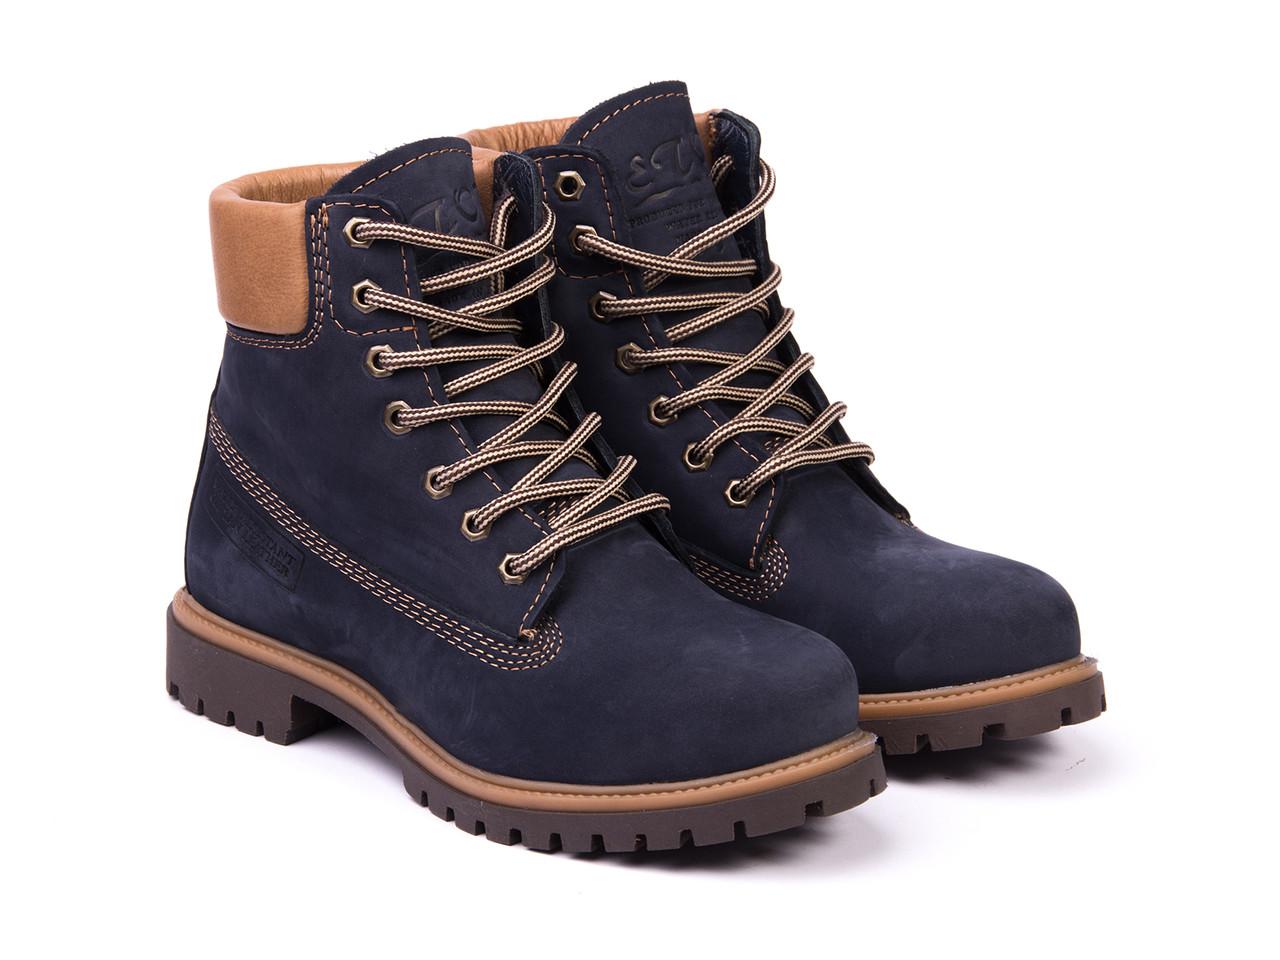 Ботинки Etor 9916-2298 синие